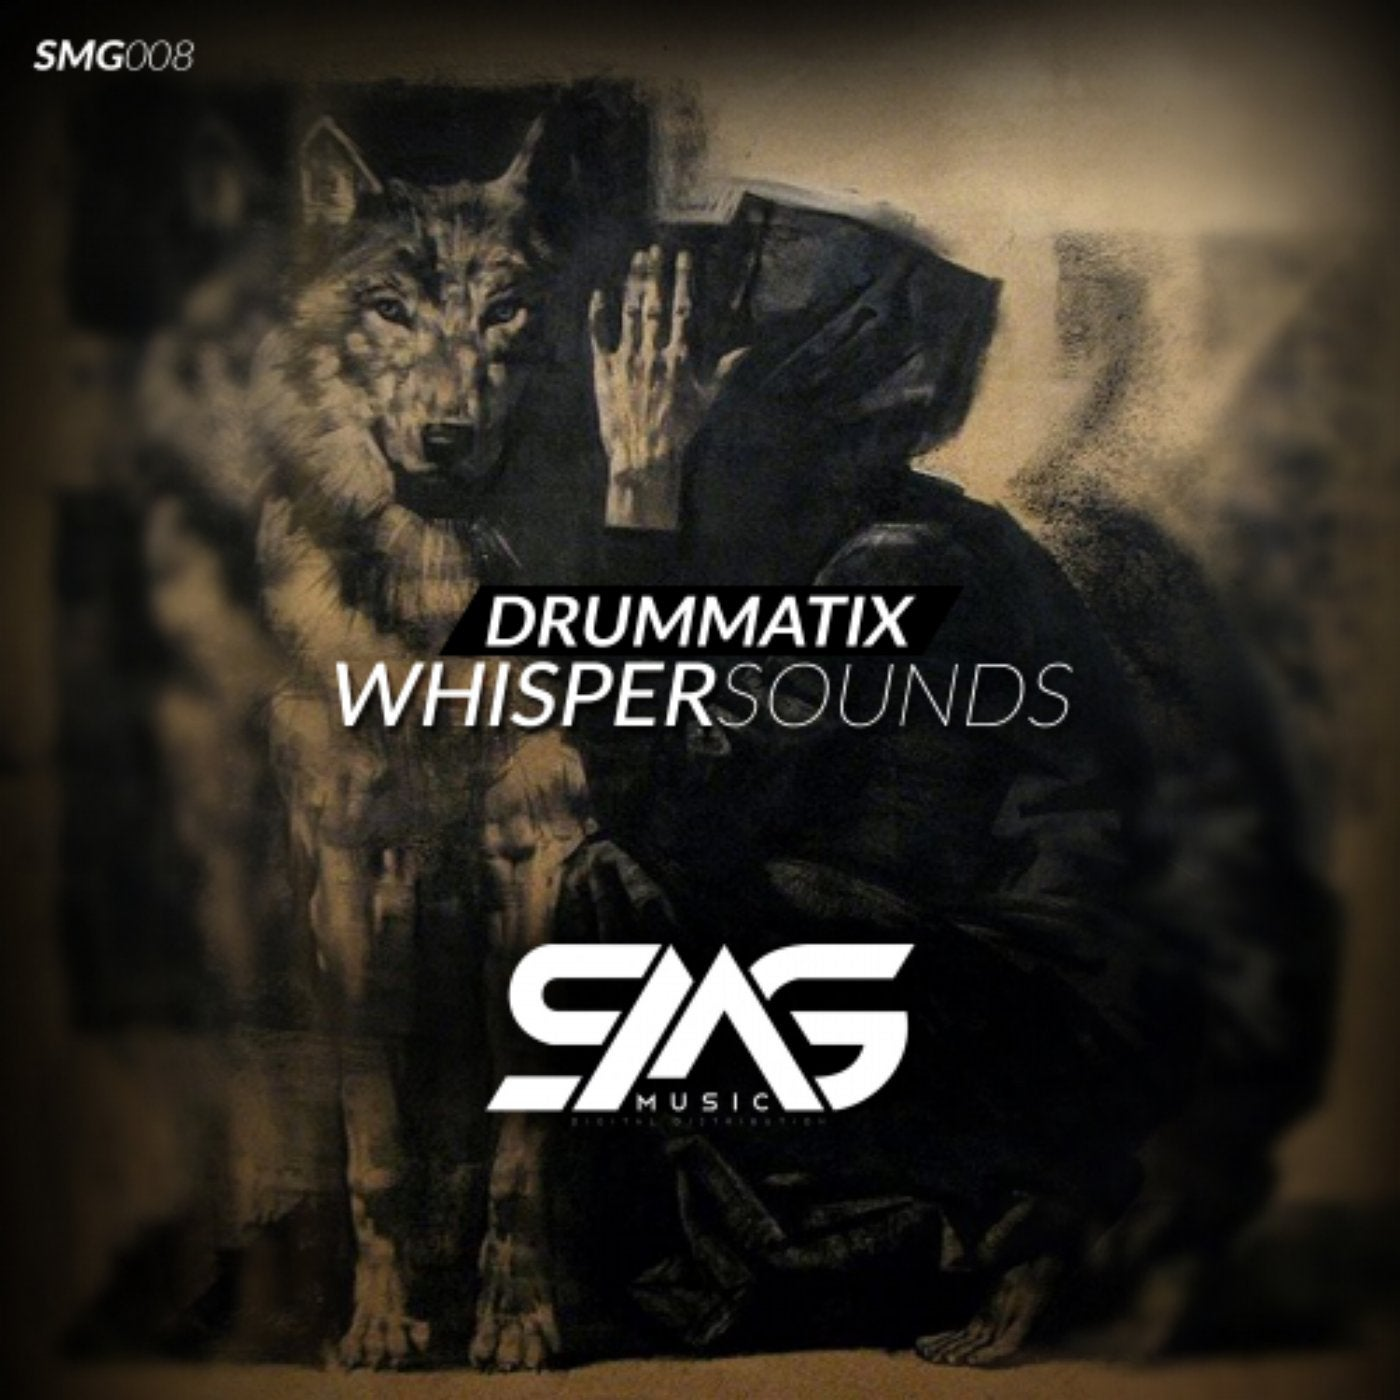 Download Drummatix - Whisper Sounds EP mp3